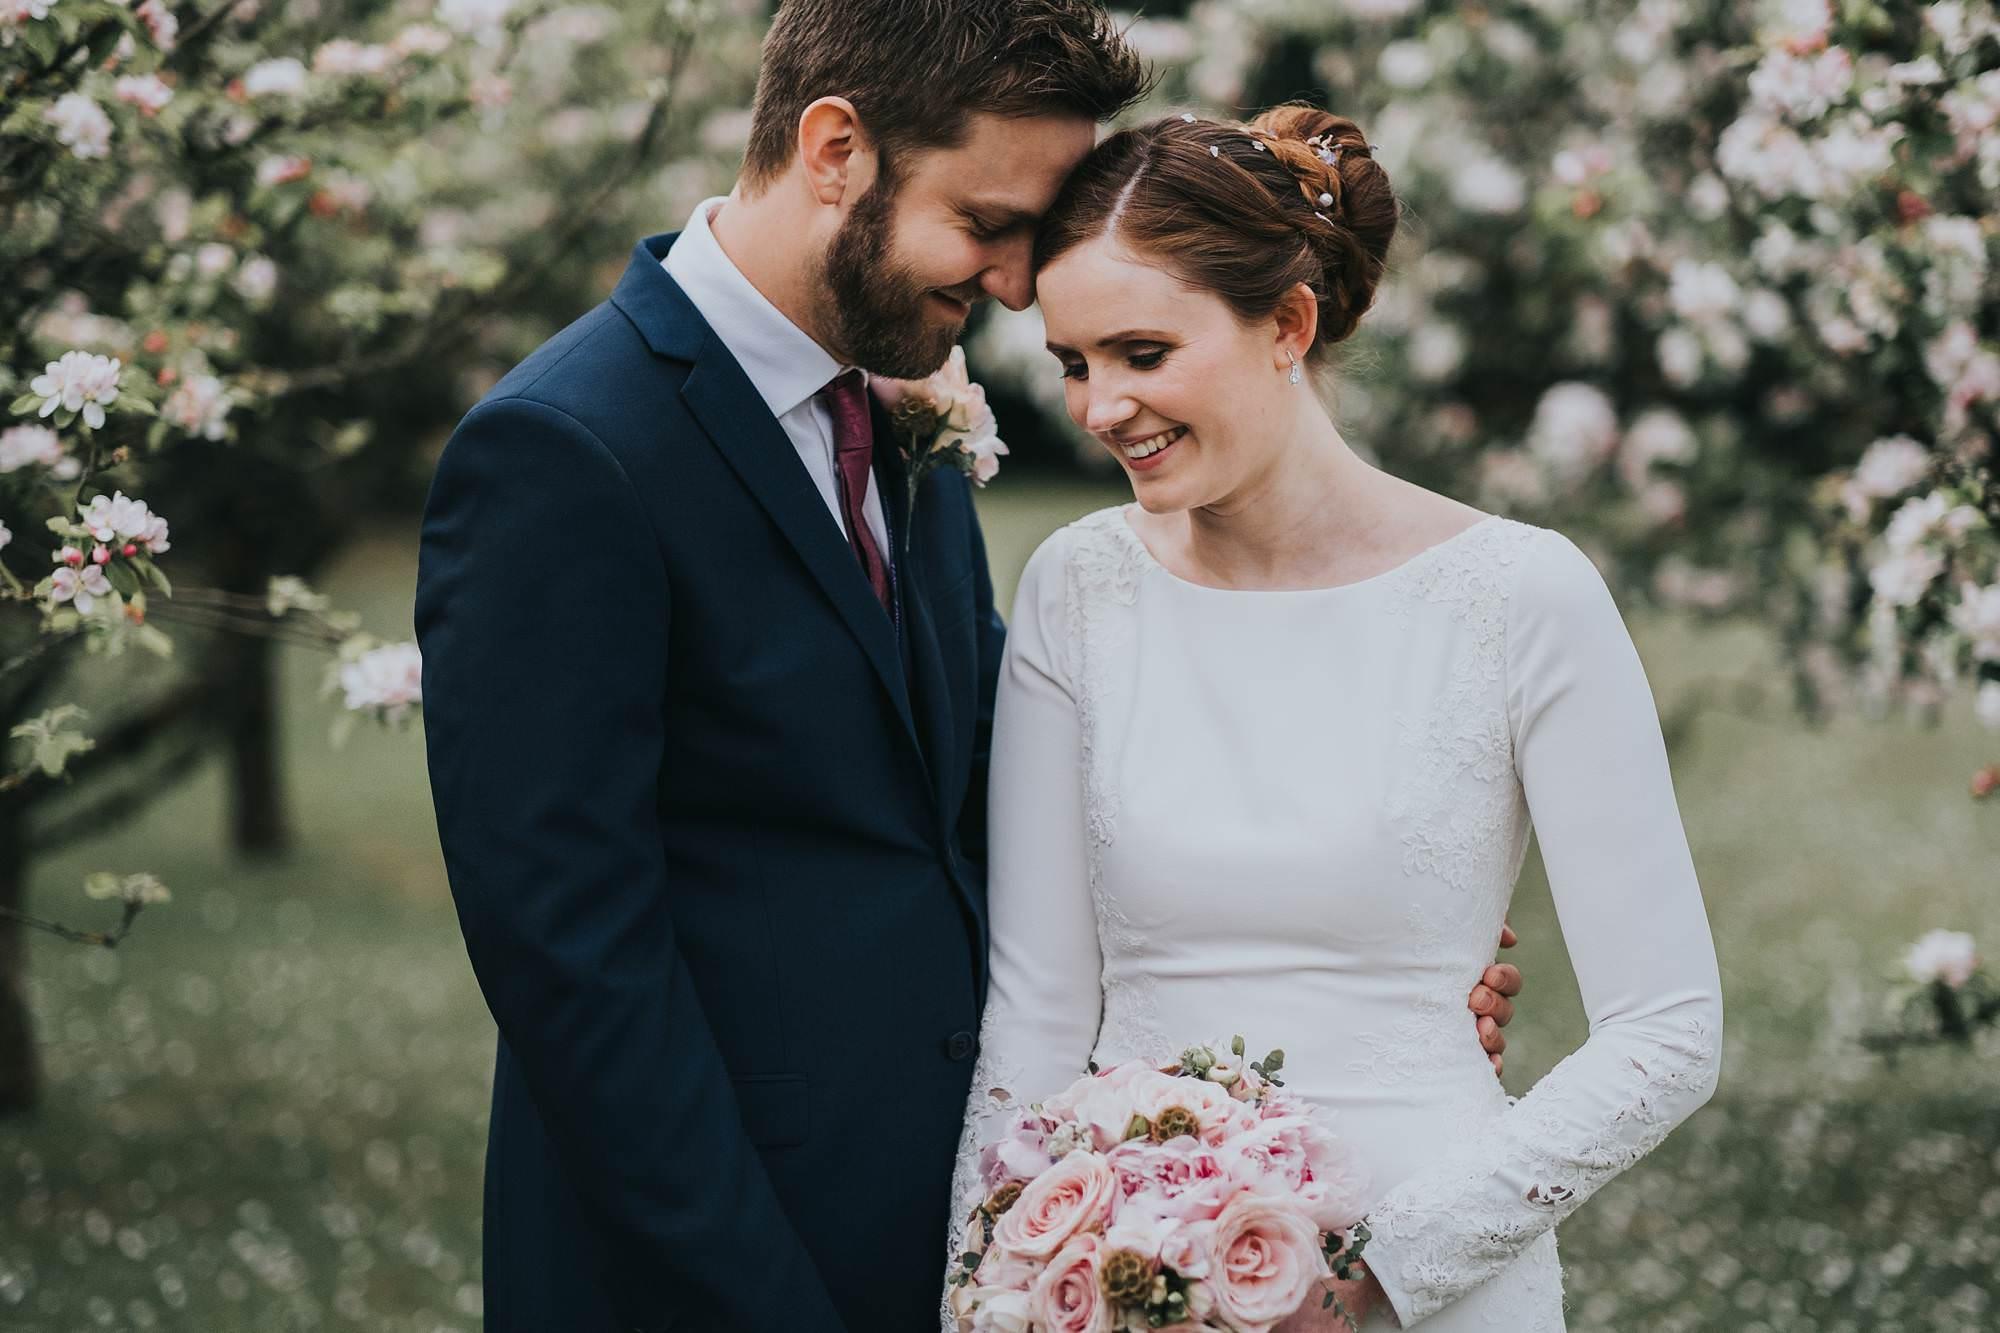 Laura noonan wedding